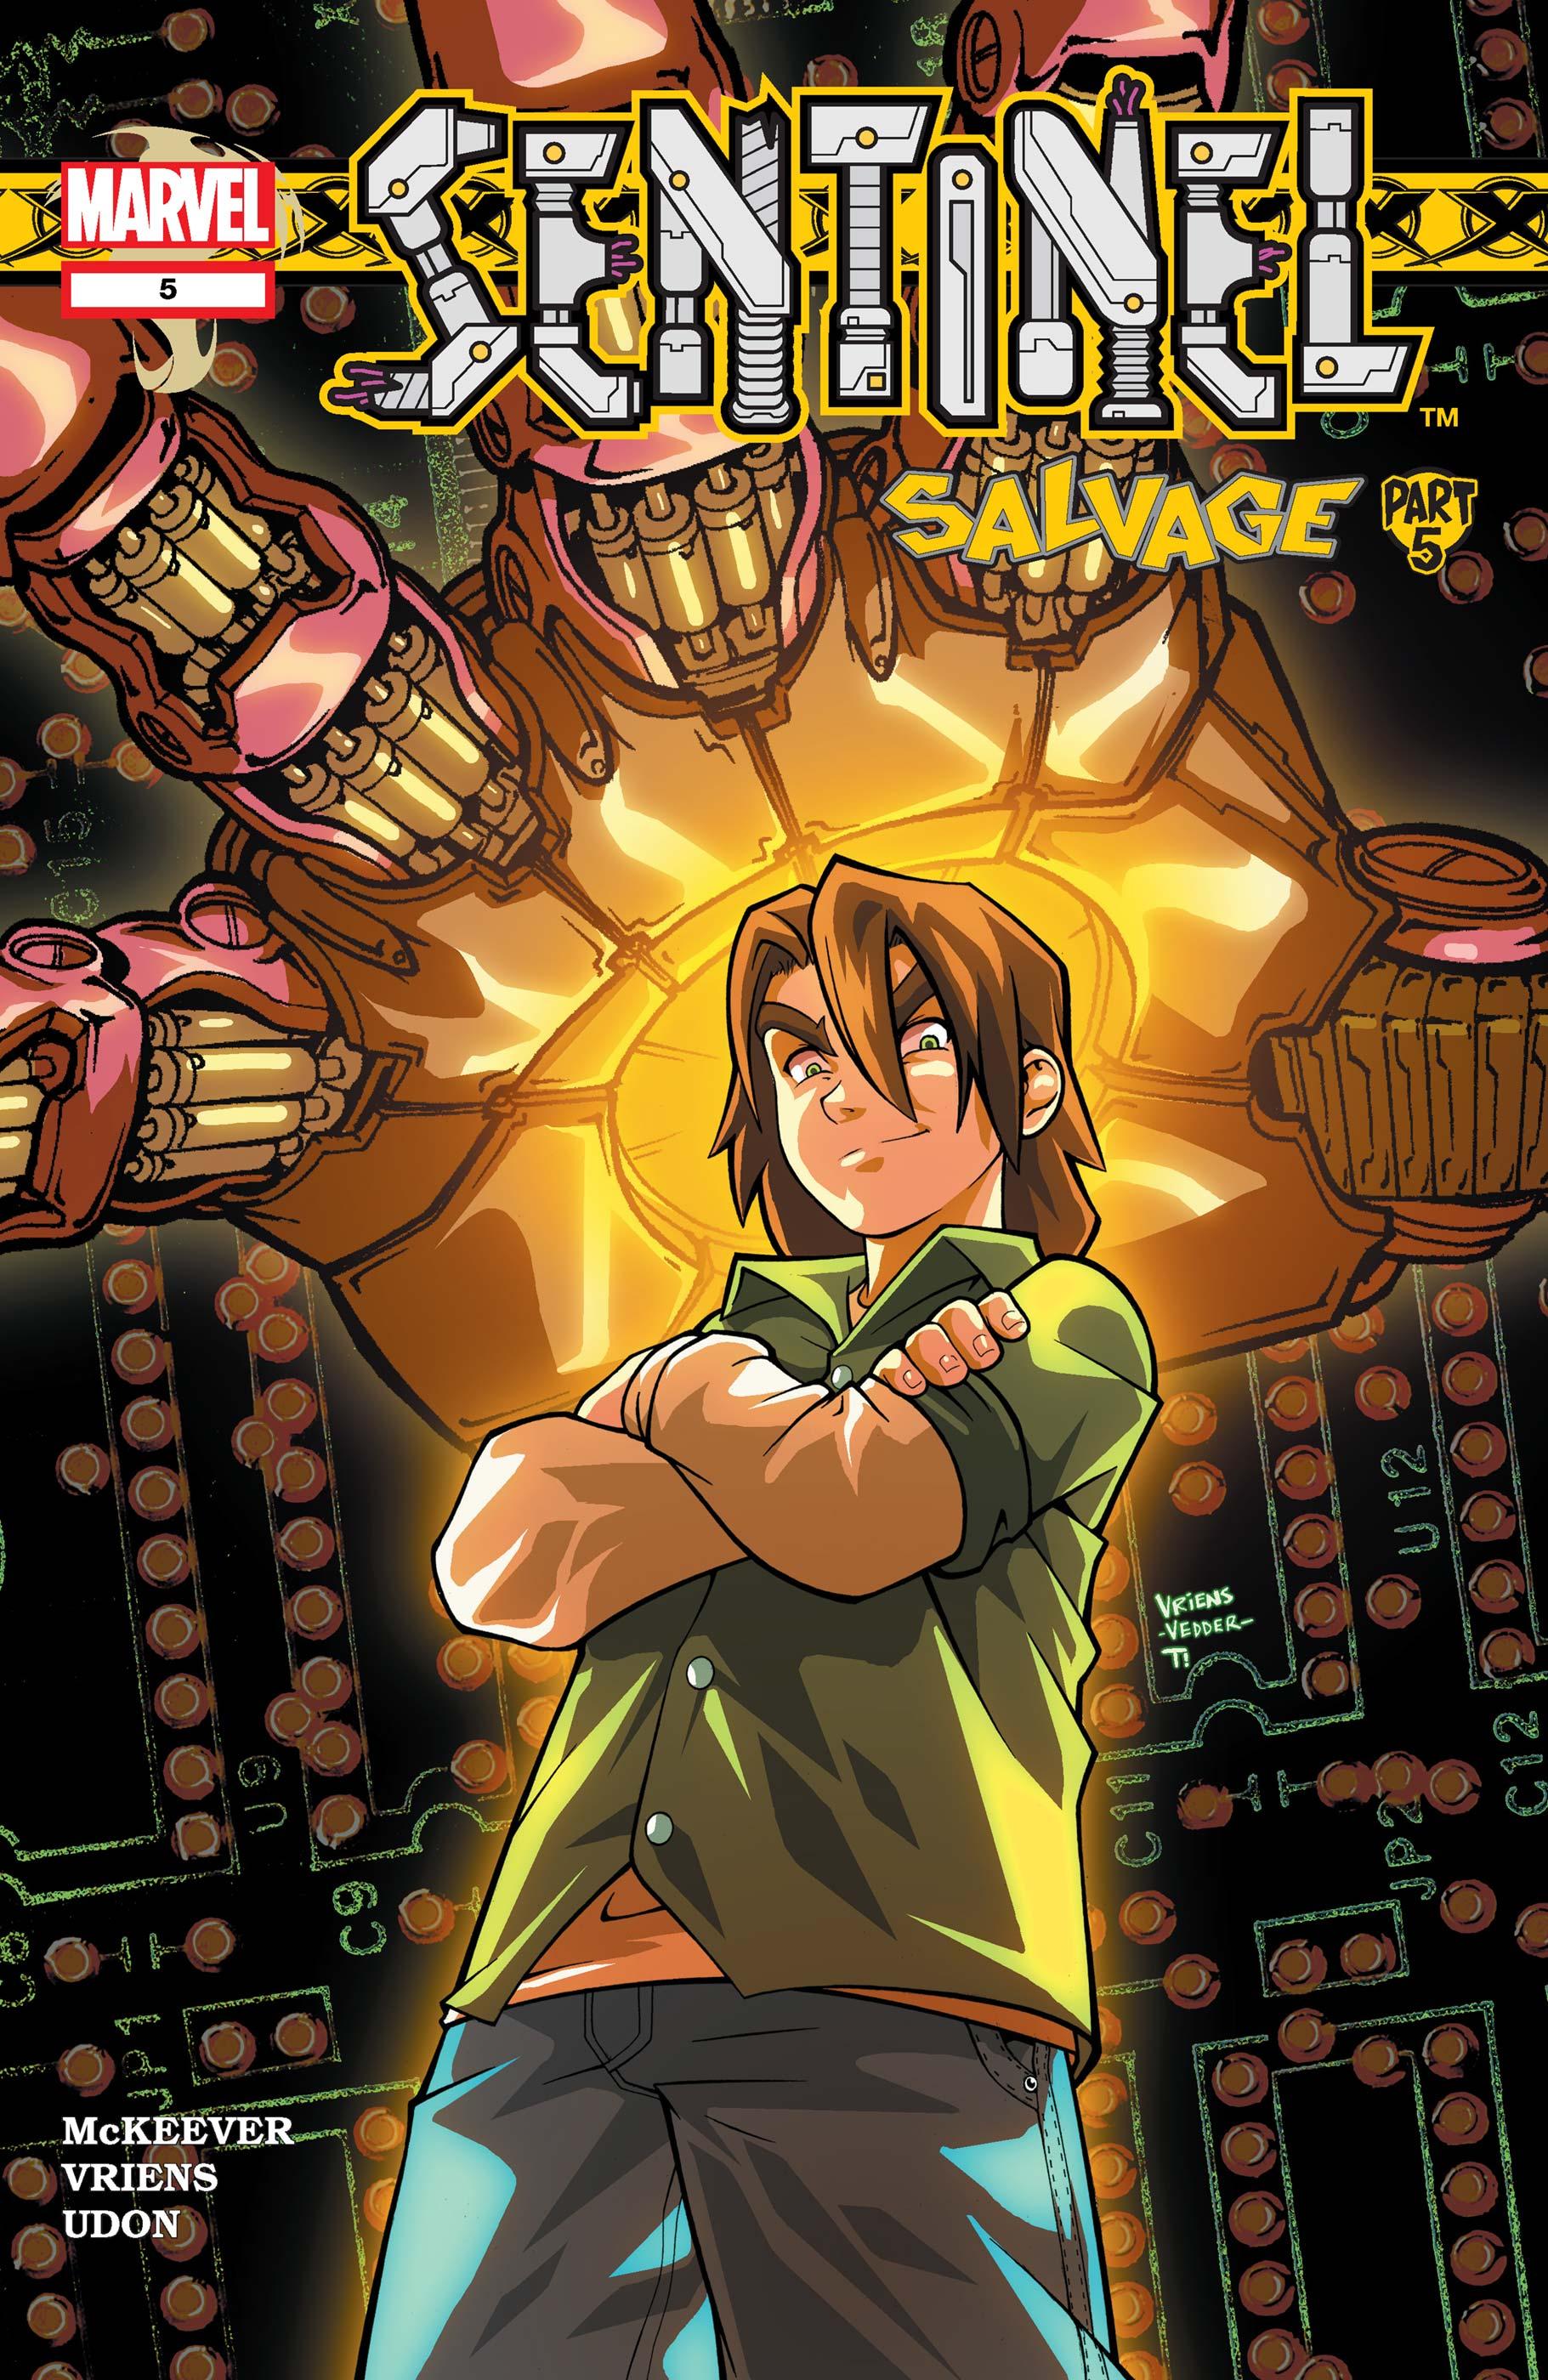 Sentinel (2003) #5